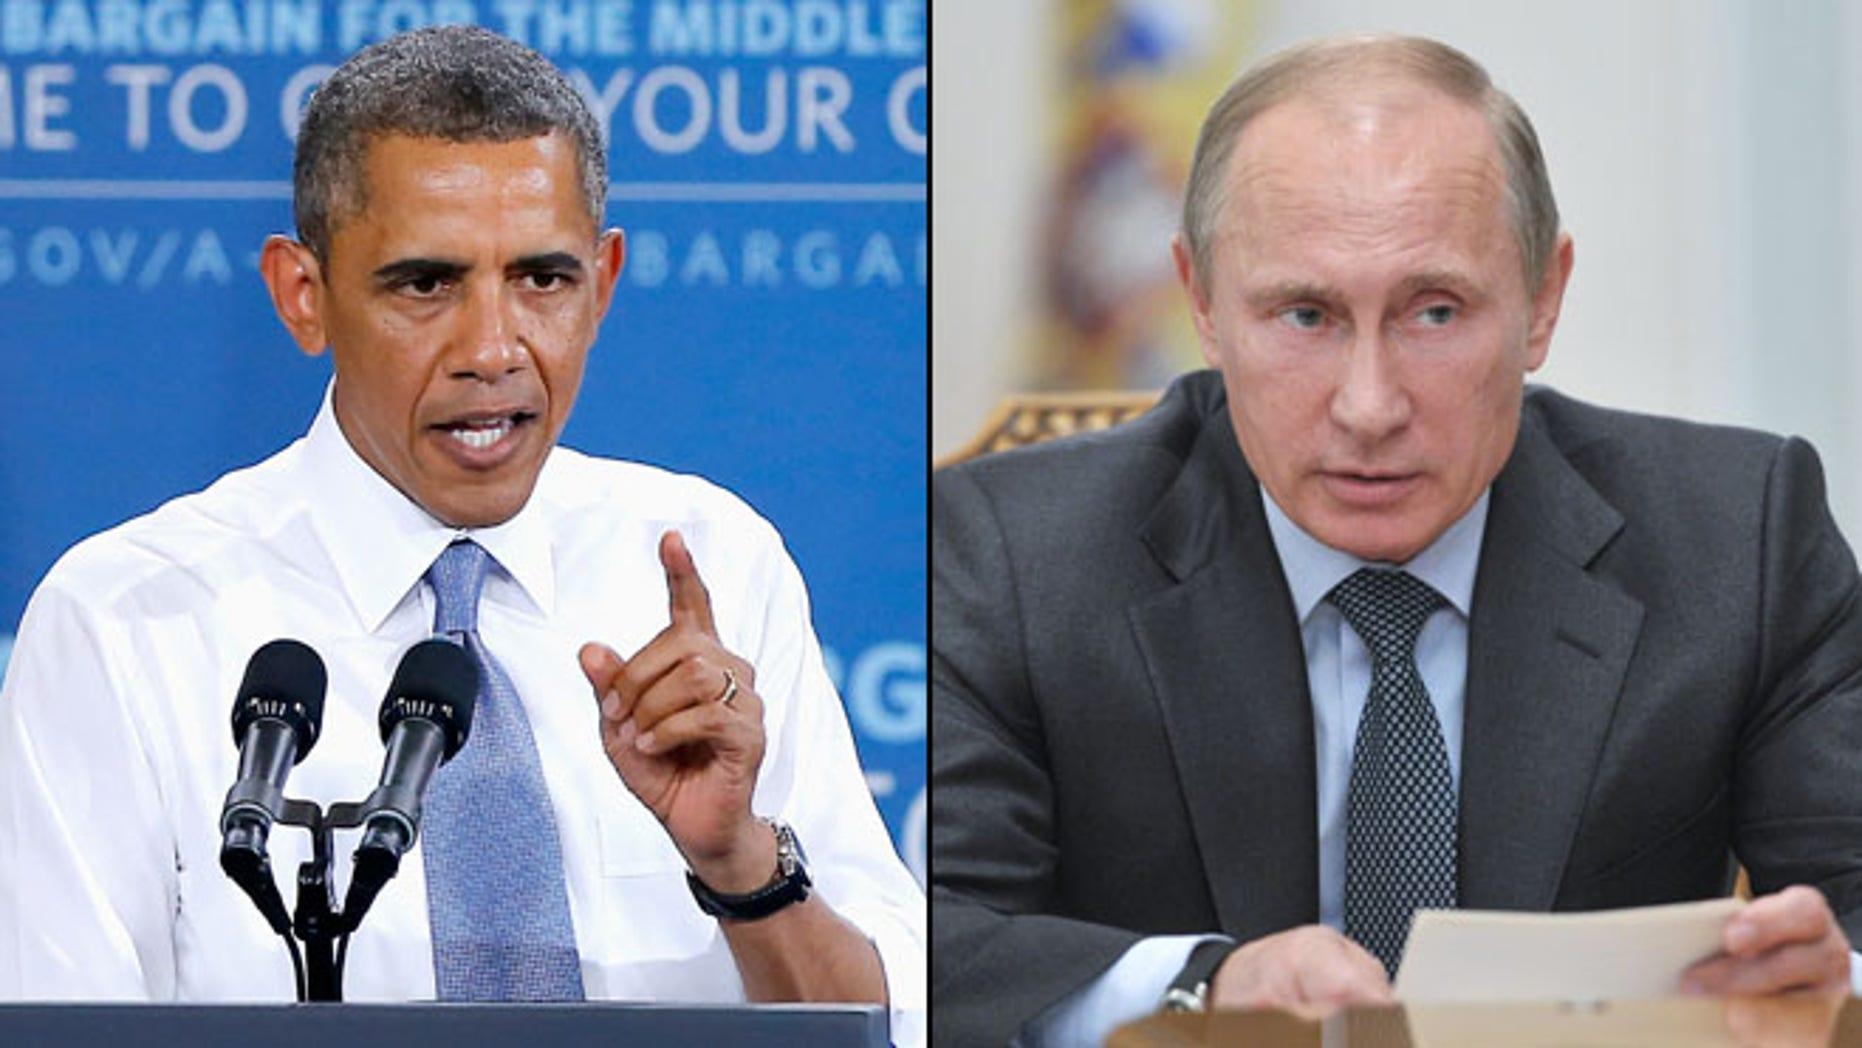 Shown here are President Obama, left, and Russian President Vladimir Putin.